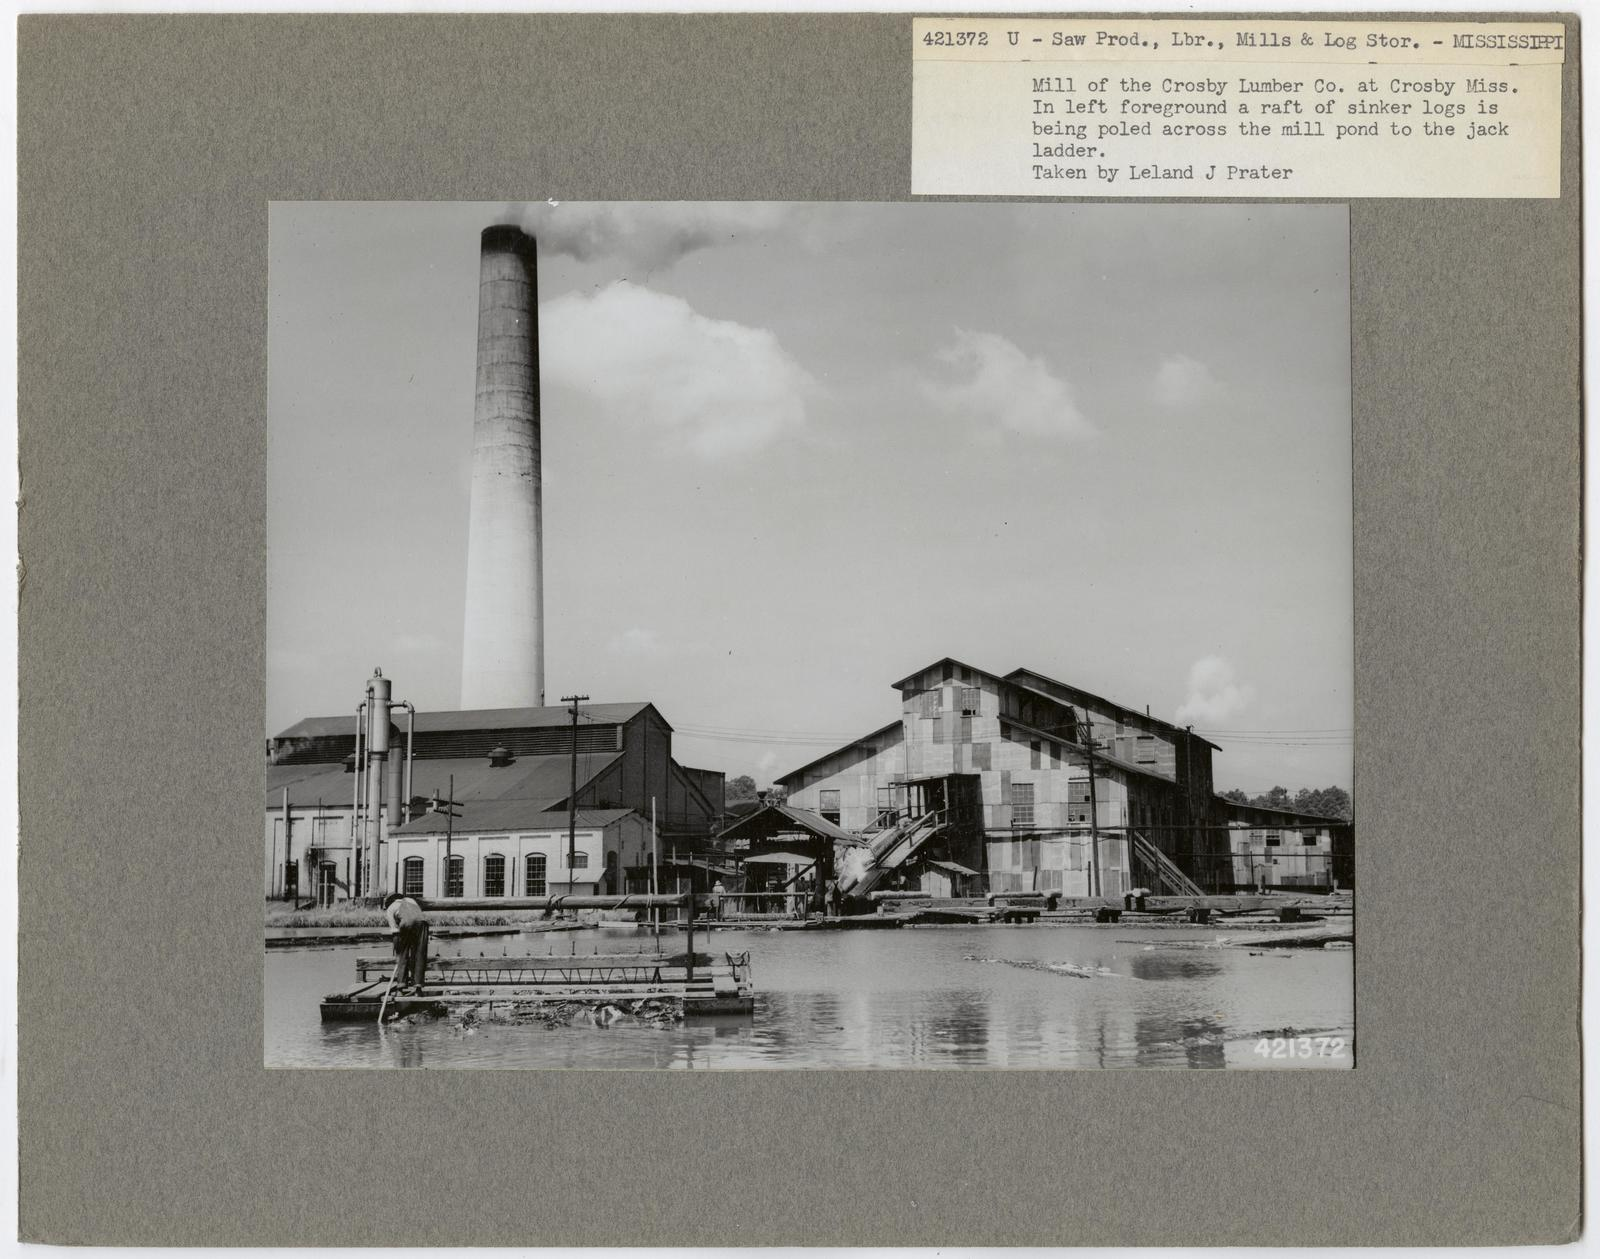 Large Sawmills - Mississippi